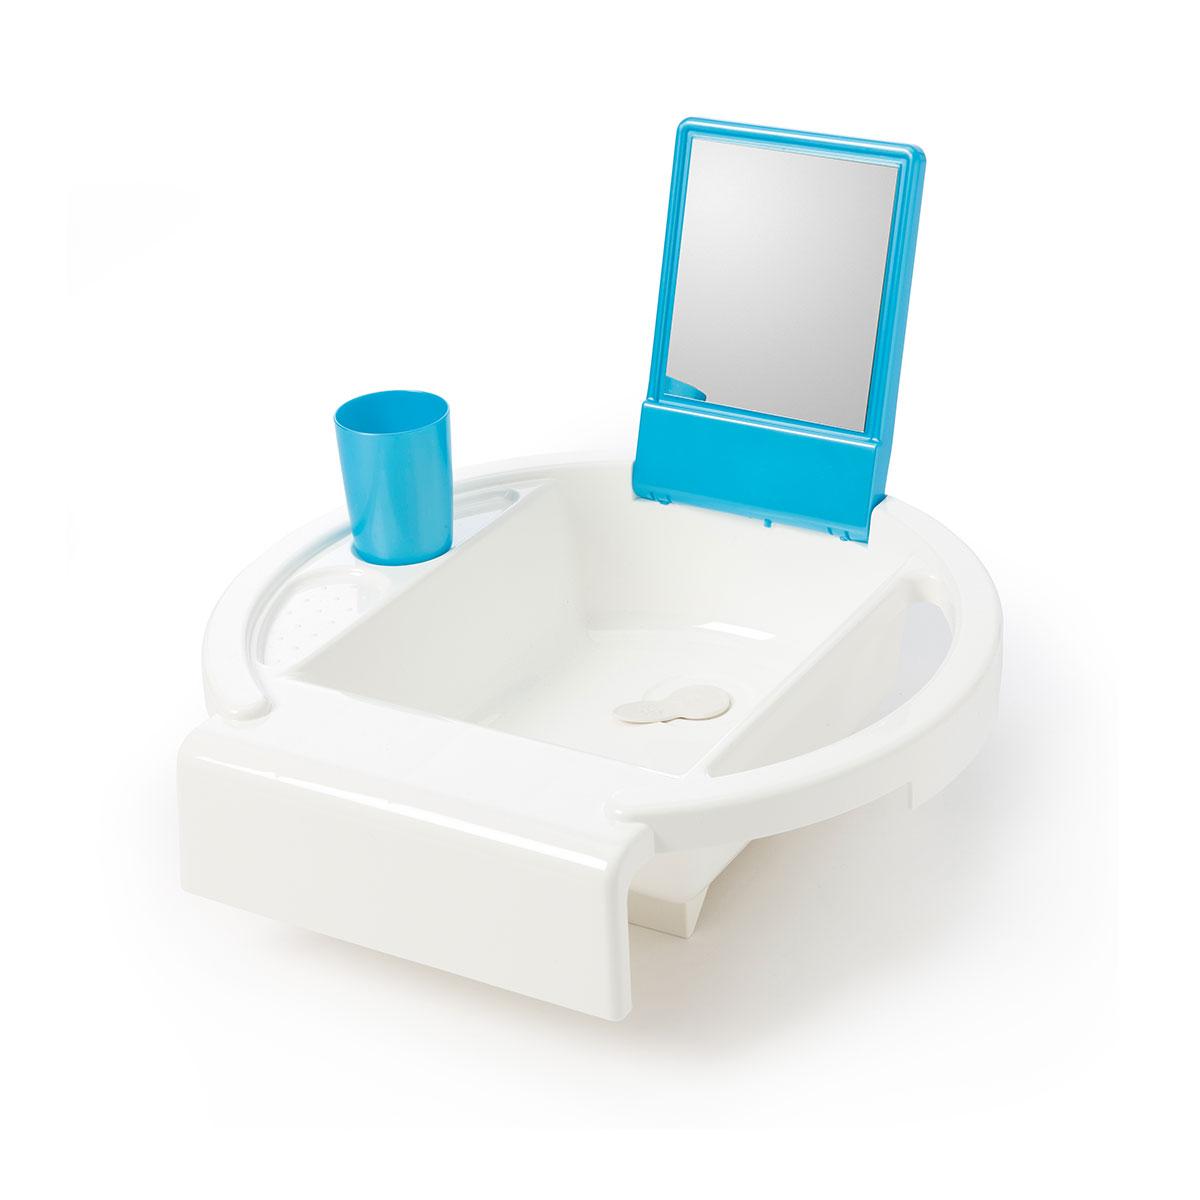 lavabo d apprentissage